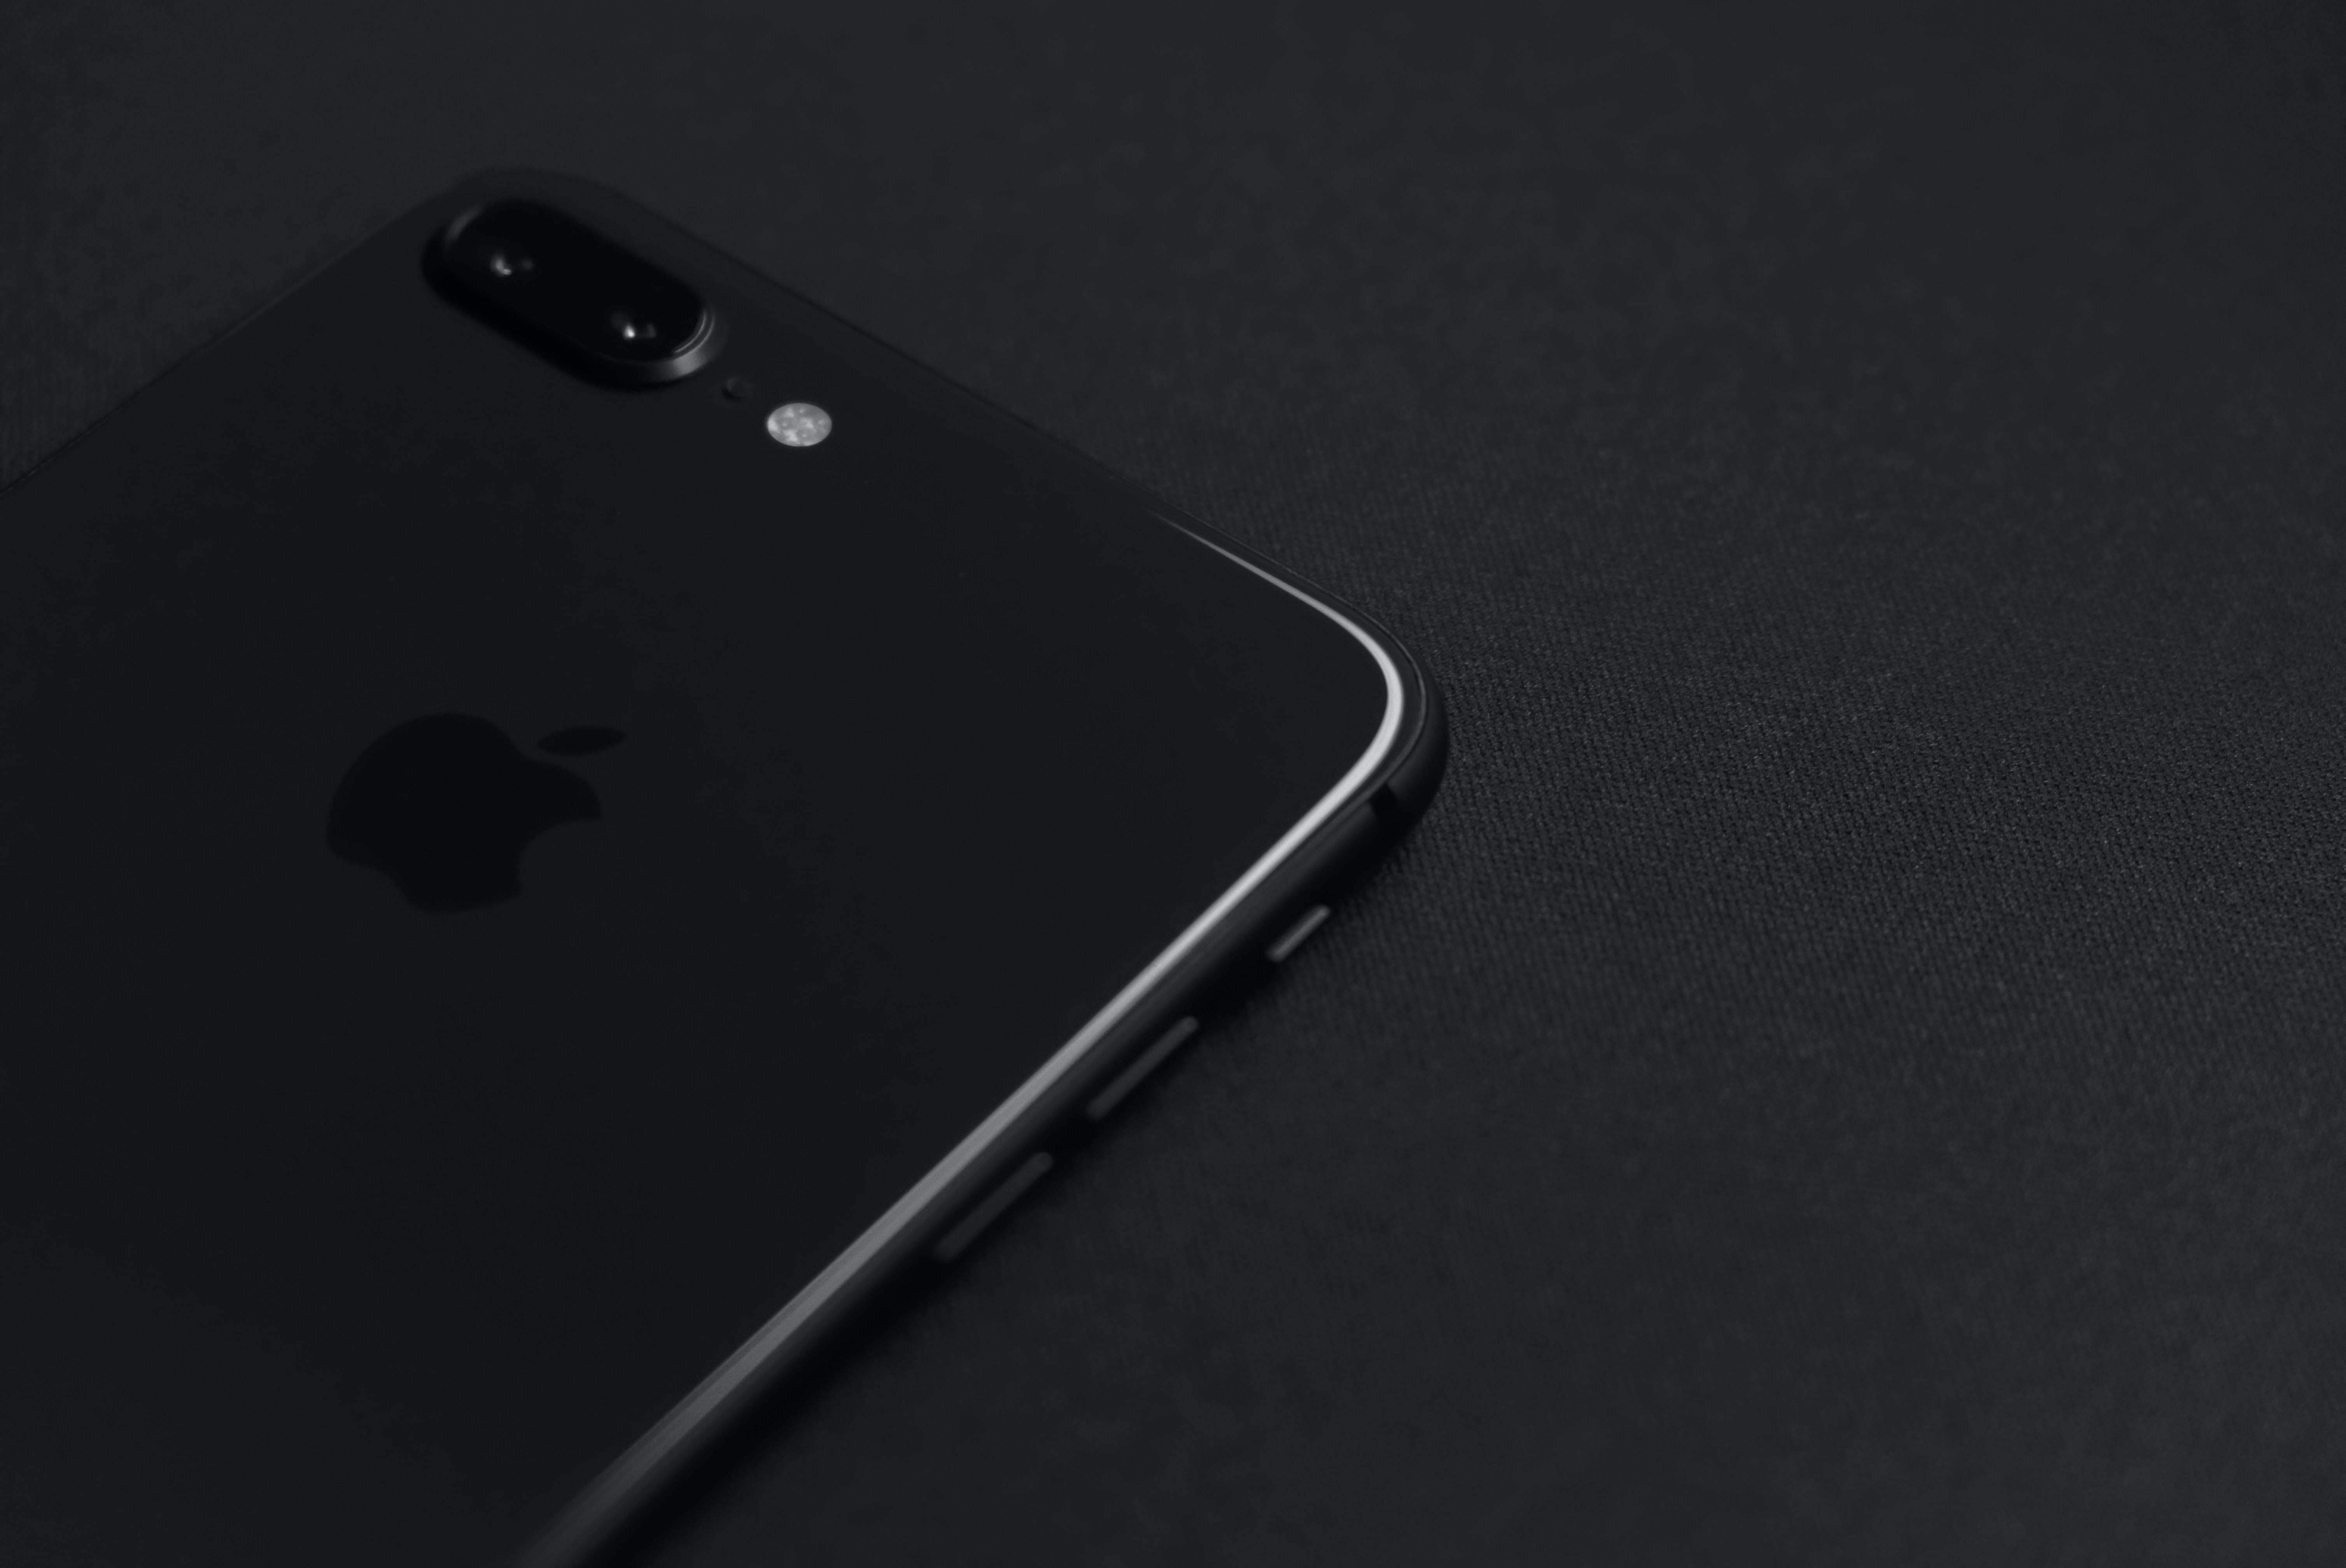 space gray iPhone 8 Plus